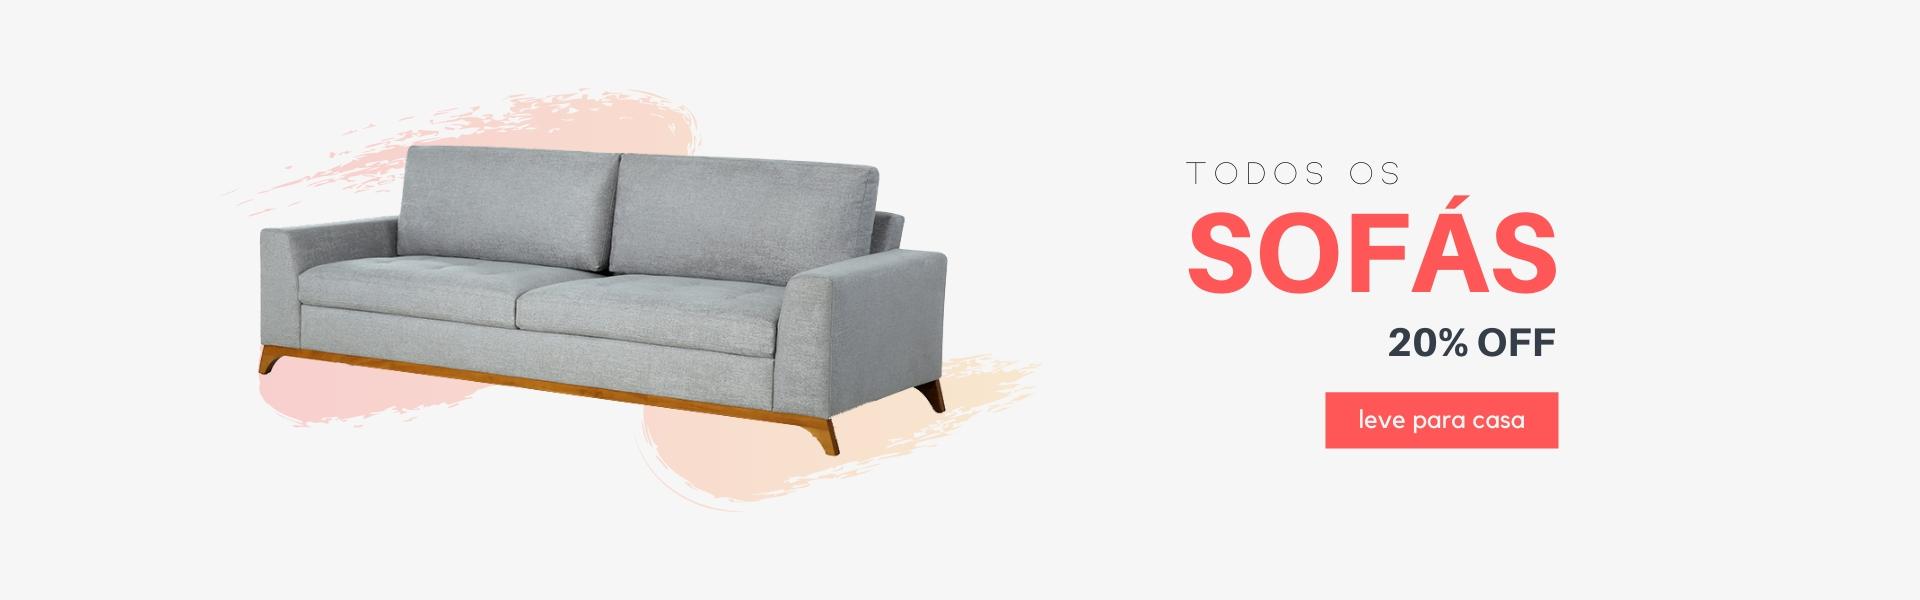 banner sofás